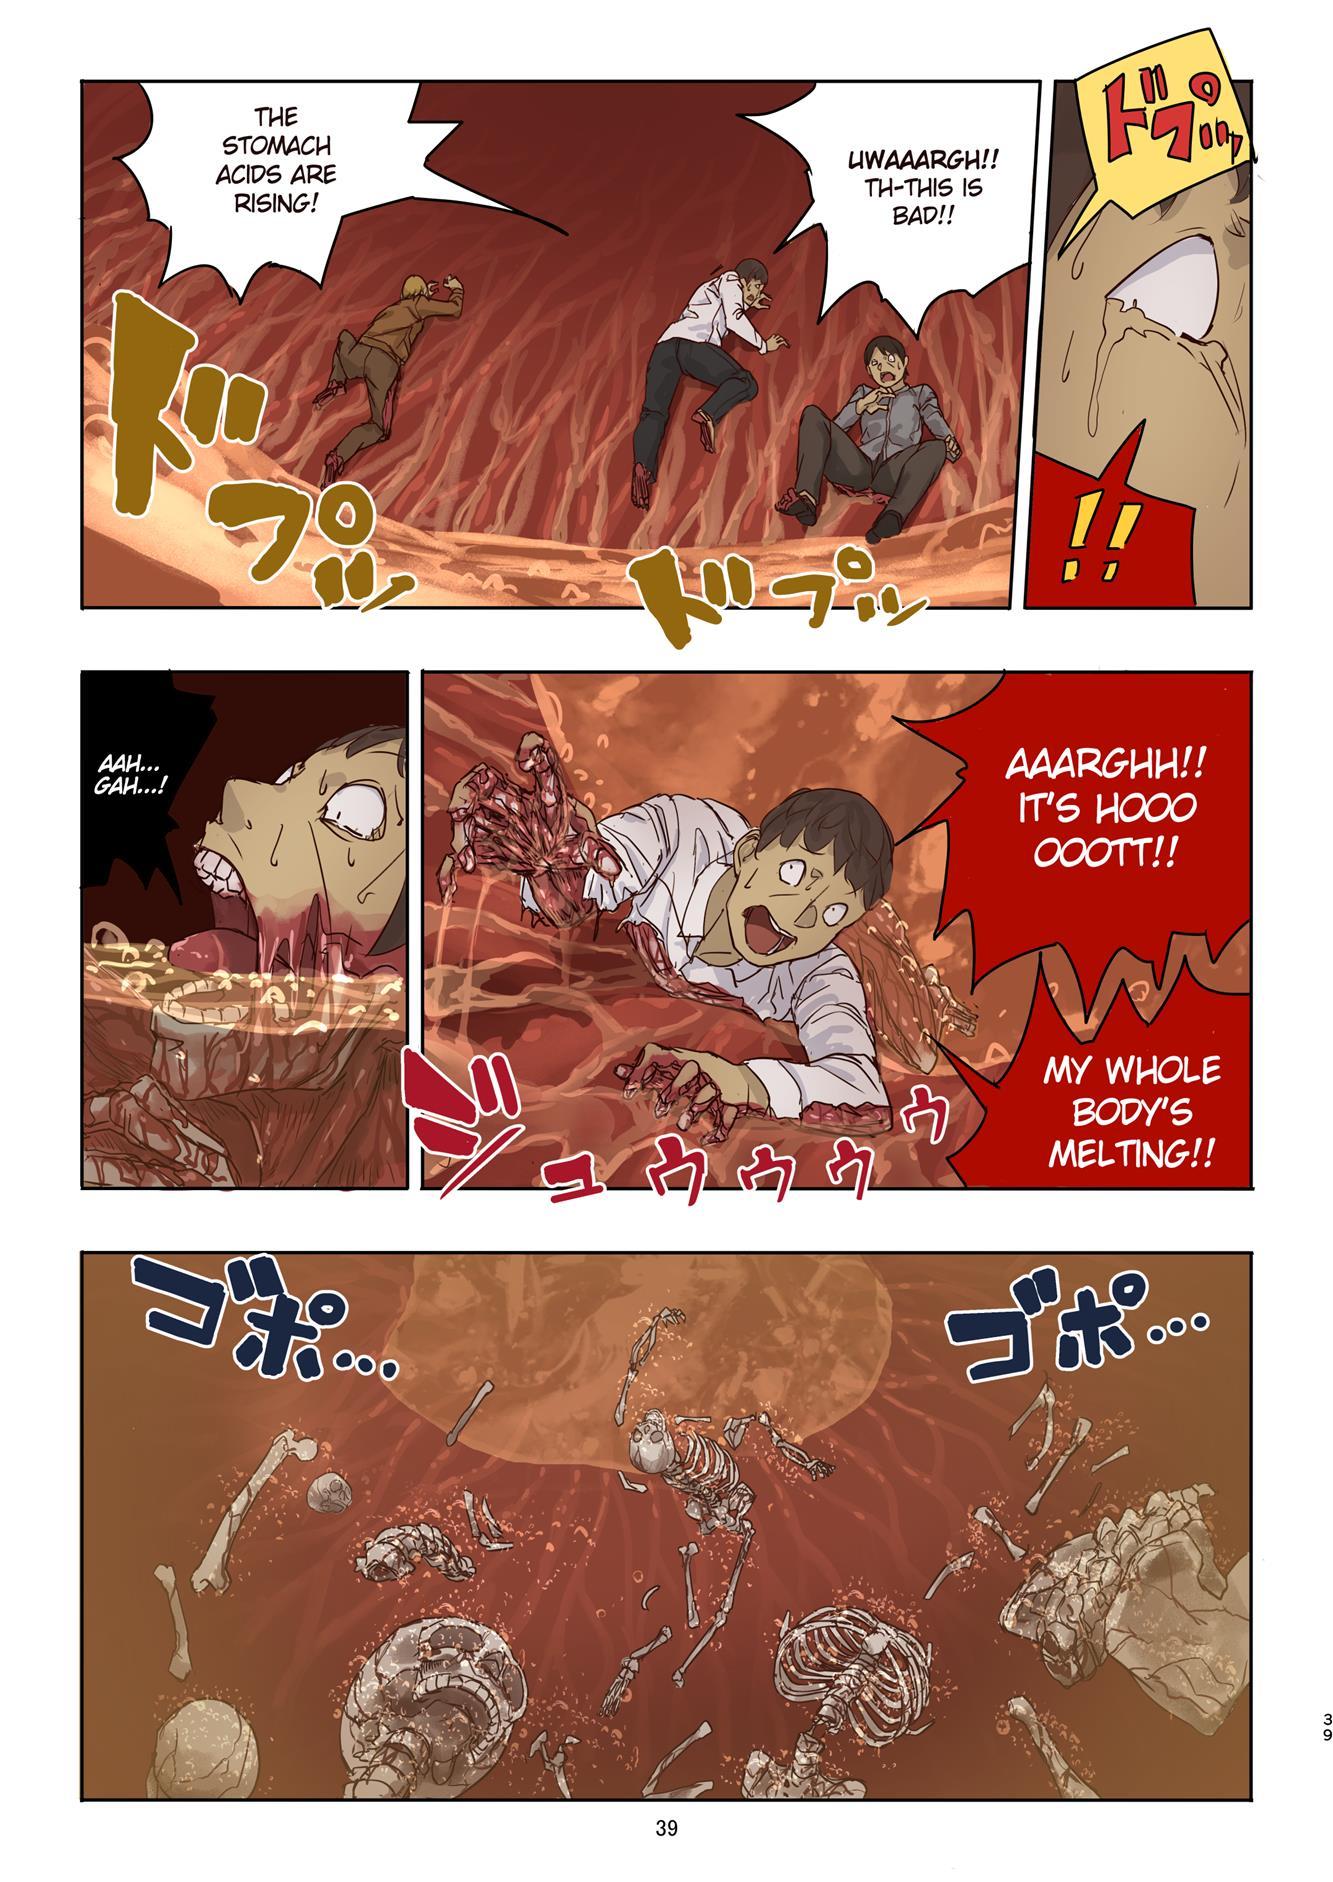 Cruel Giantess Fondue-chan's Sexy Slaughter Time - Foto 39